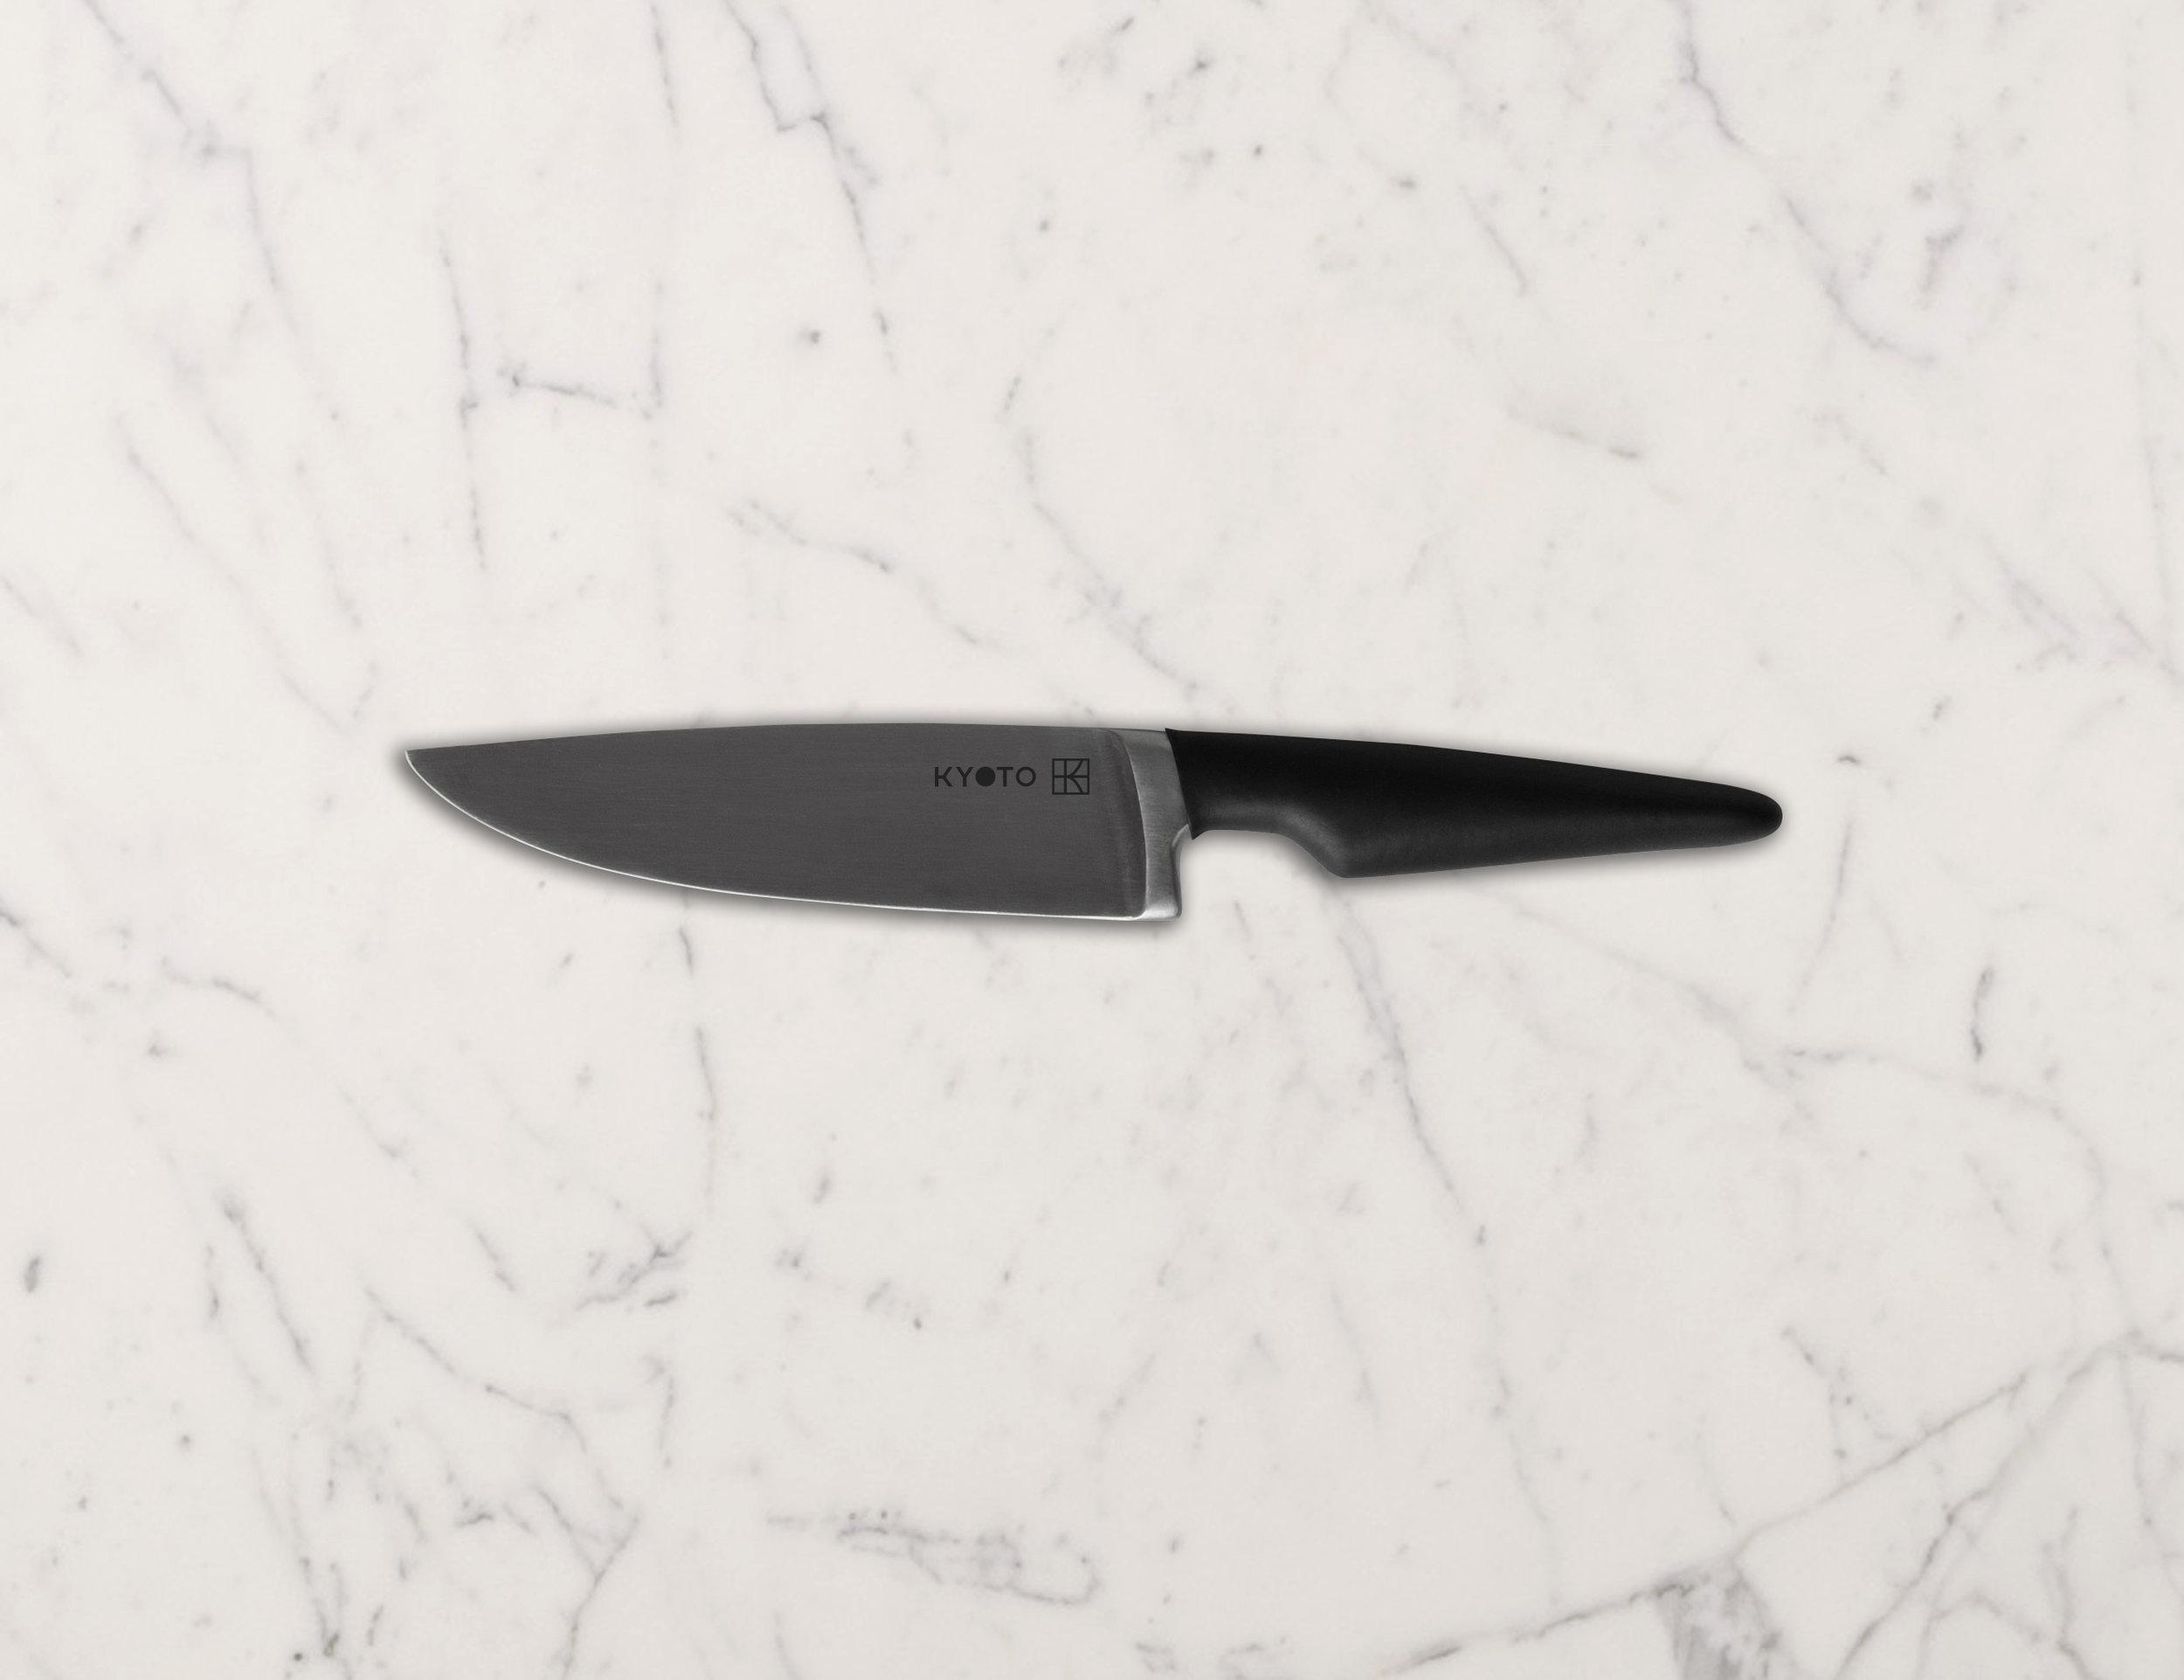 Kyoto_Knife2.jpg